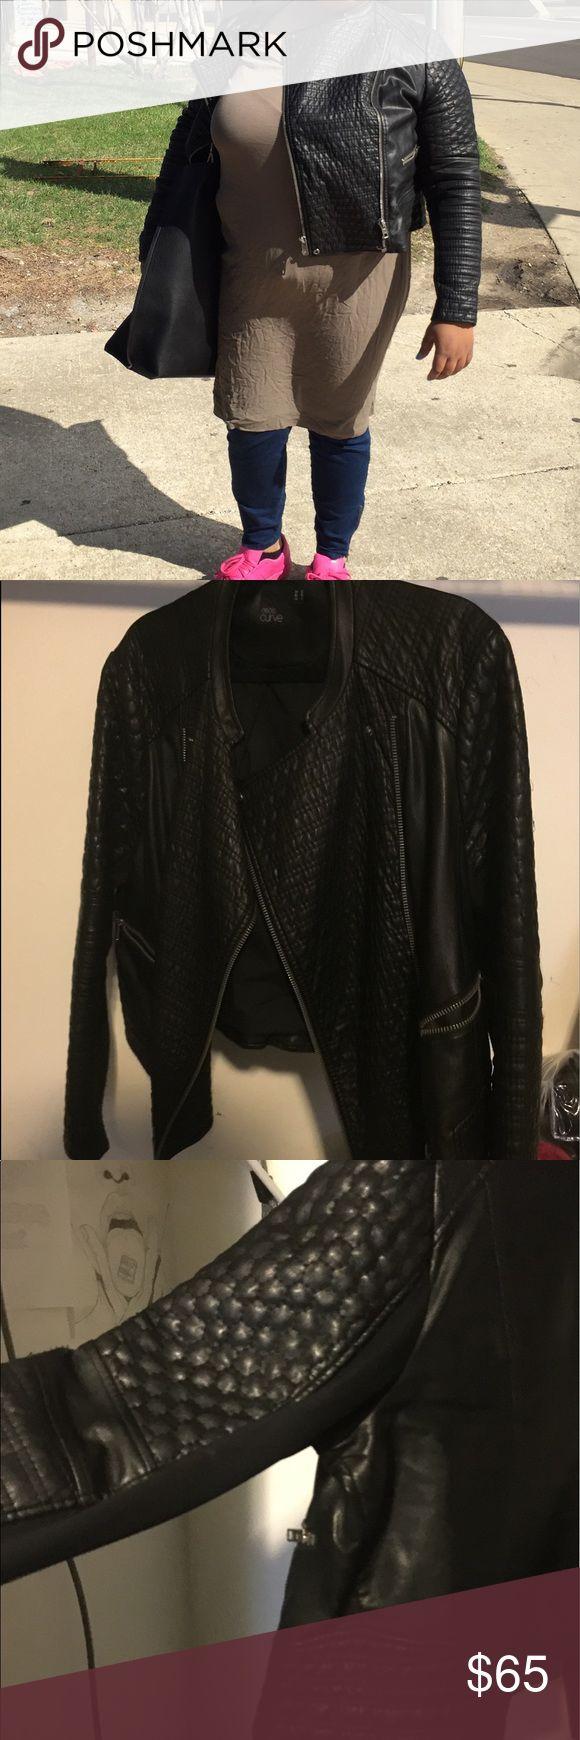 Jacket Asos curve leather jacket. Size 18. Excellent condition ASOS Curve Jackets & Coats